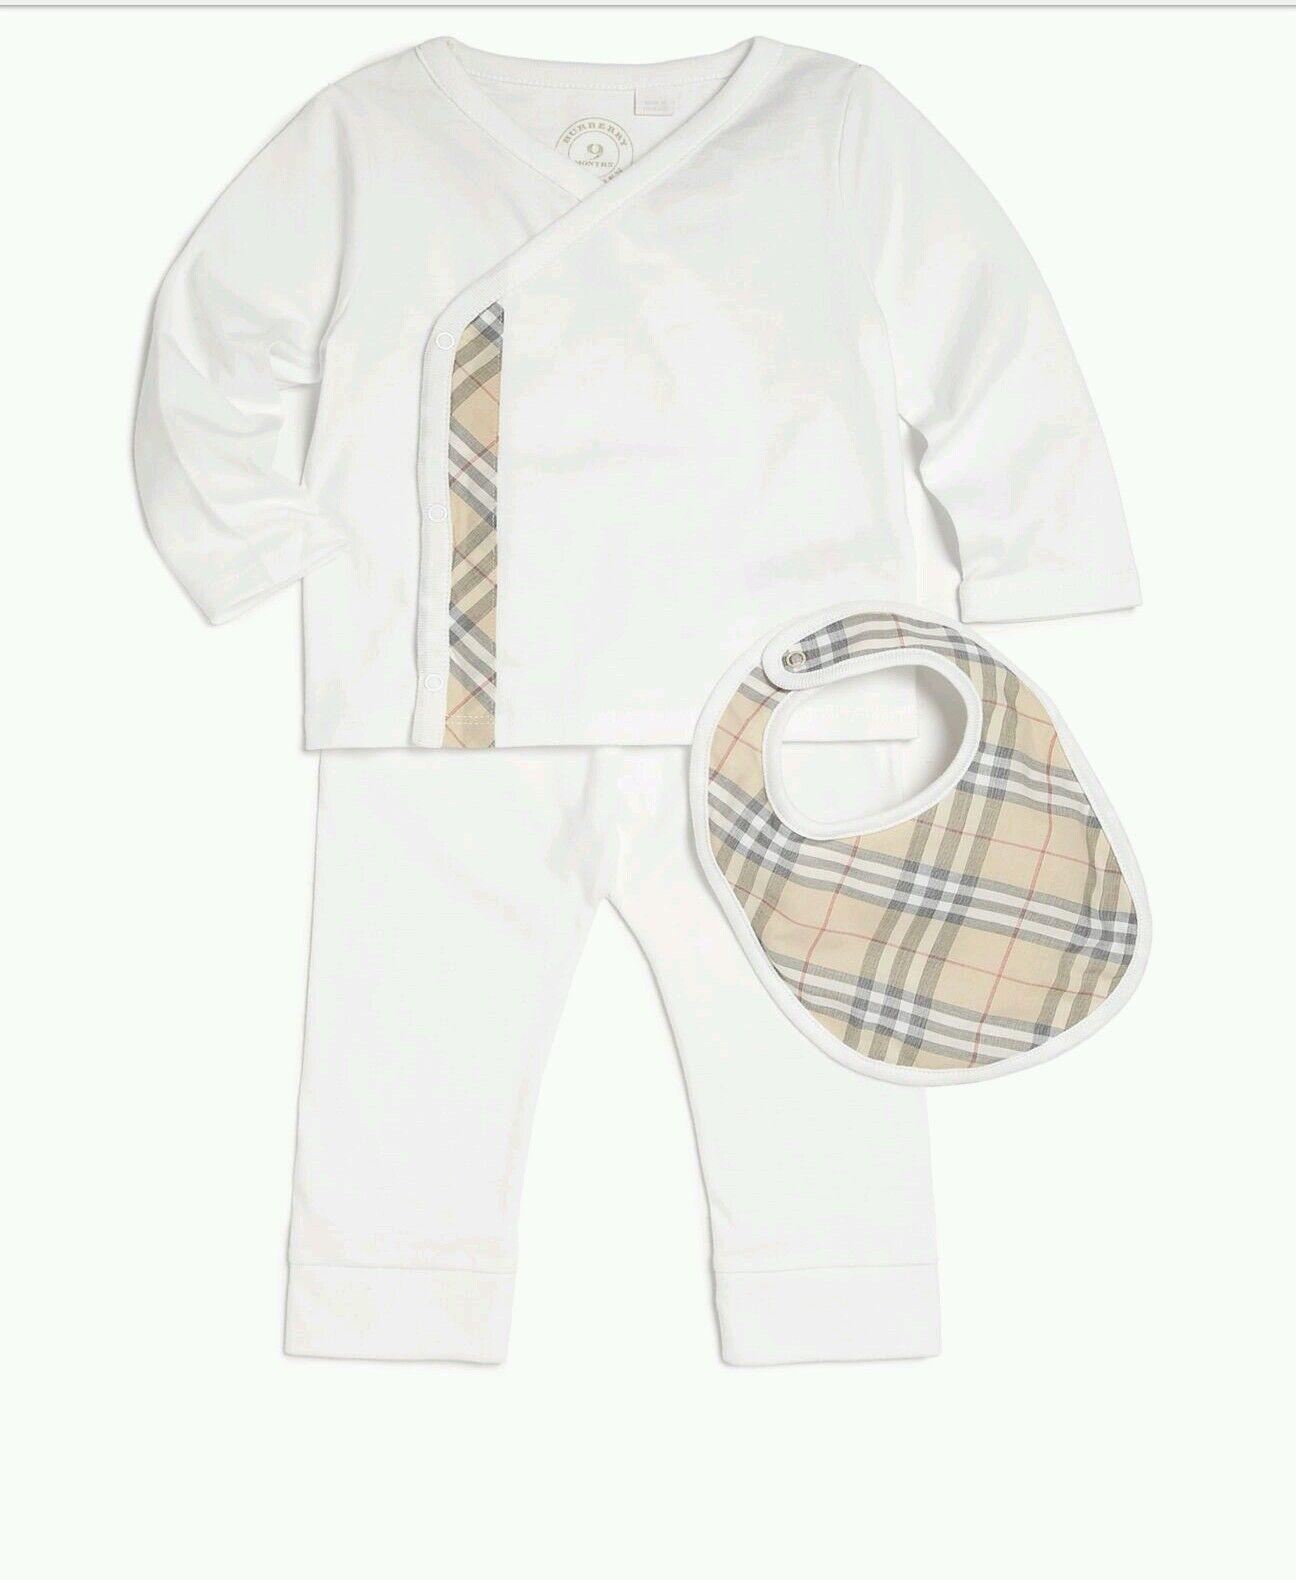 Boys Clothing Newborn 5T Baby & Toddler Clothing Clothing